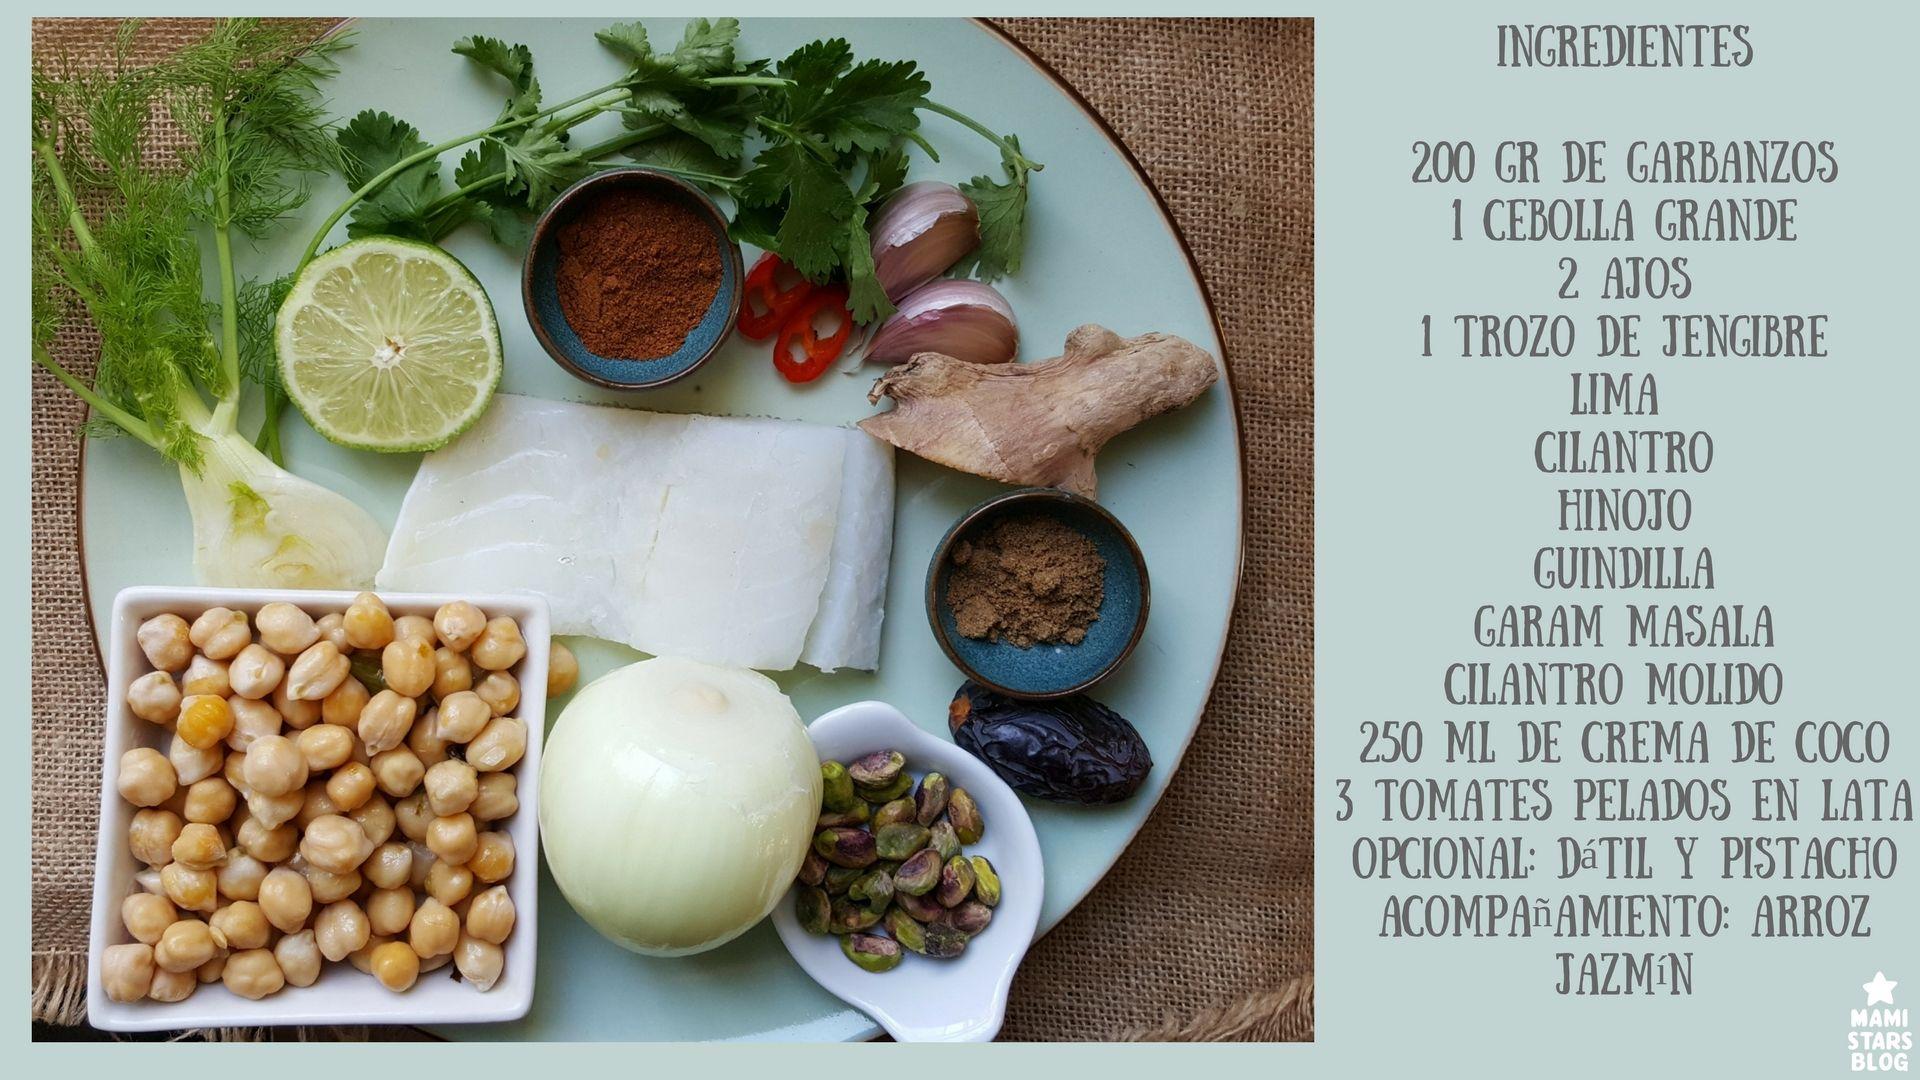 Receta Tajine de Garbanzos y bacalao al garam masala